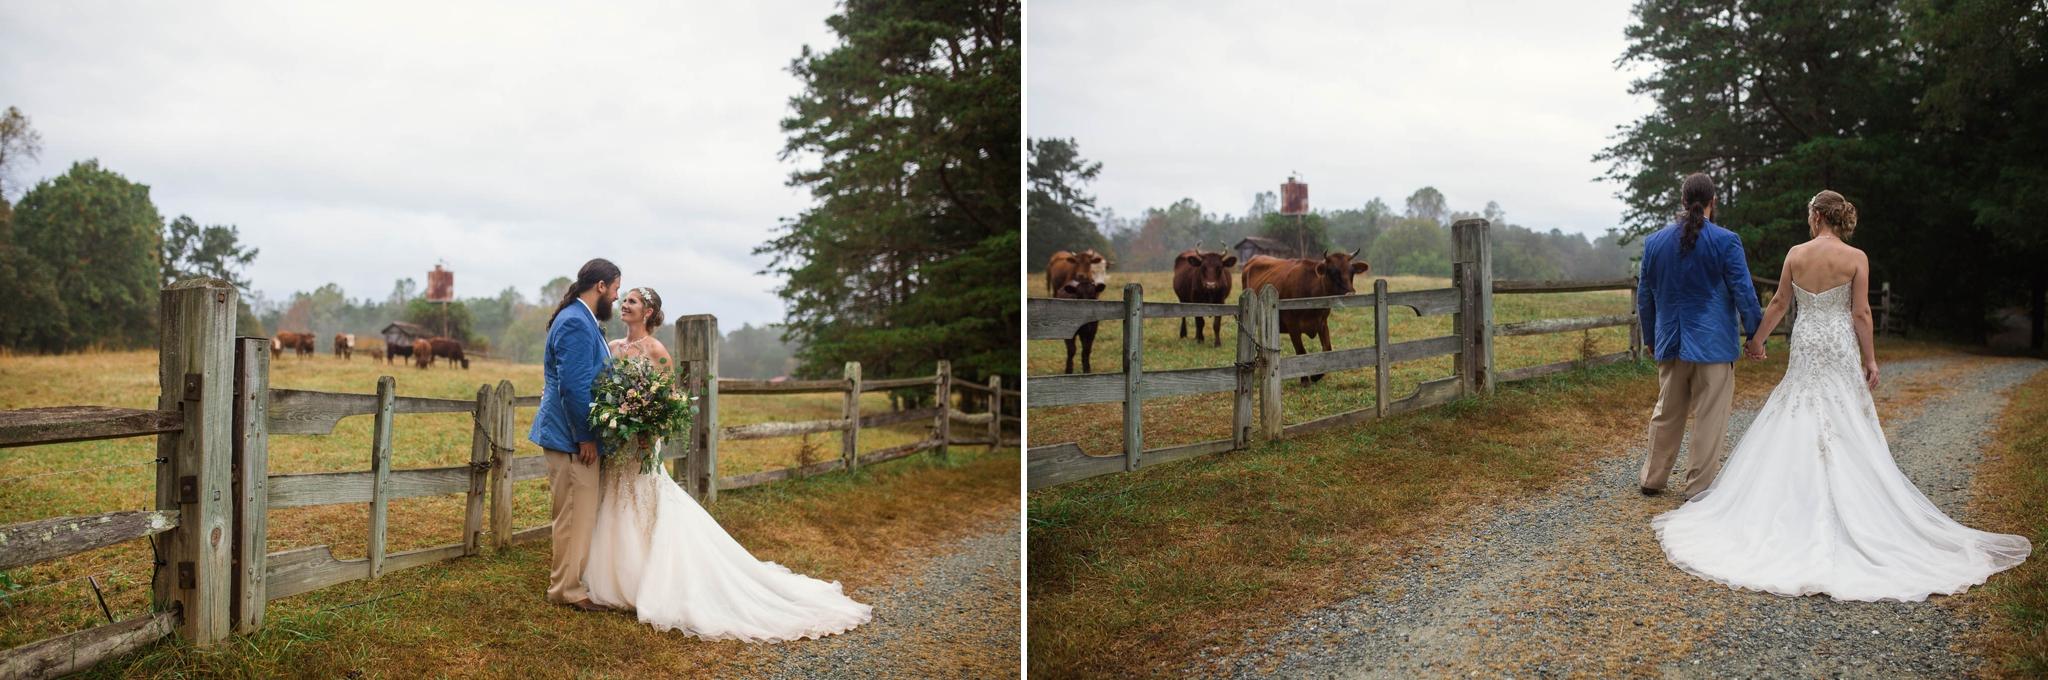 Wedding Photography at the Timberlake Earth Sanctuary in Whitsett, NC - Raleigh North Carolina Wedding Photographer 18.jpg